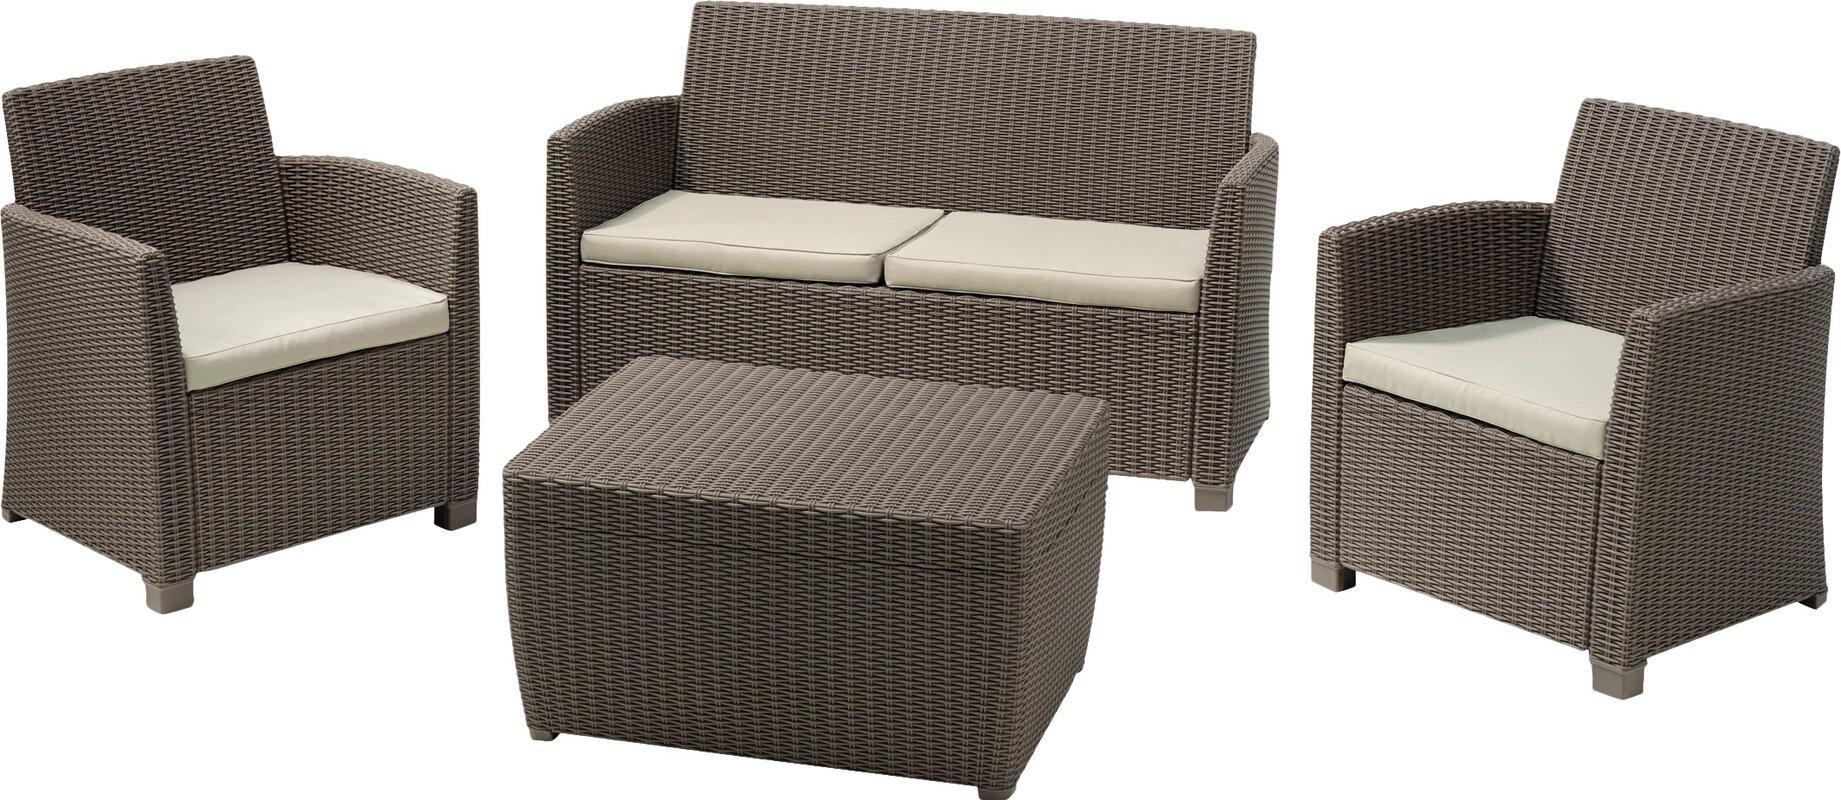 garten living 4 tlg lounge set bali mit kissen bewertungen. Black Bedroom Furniture Sets. Home Design Ideas